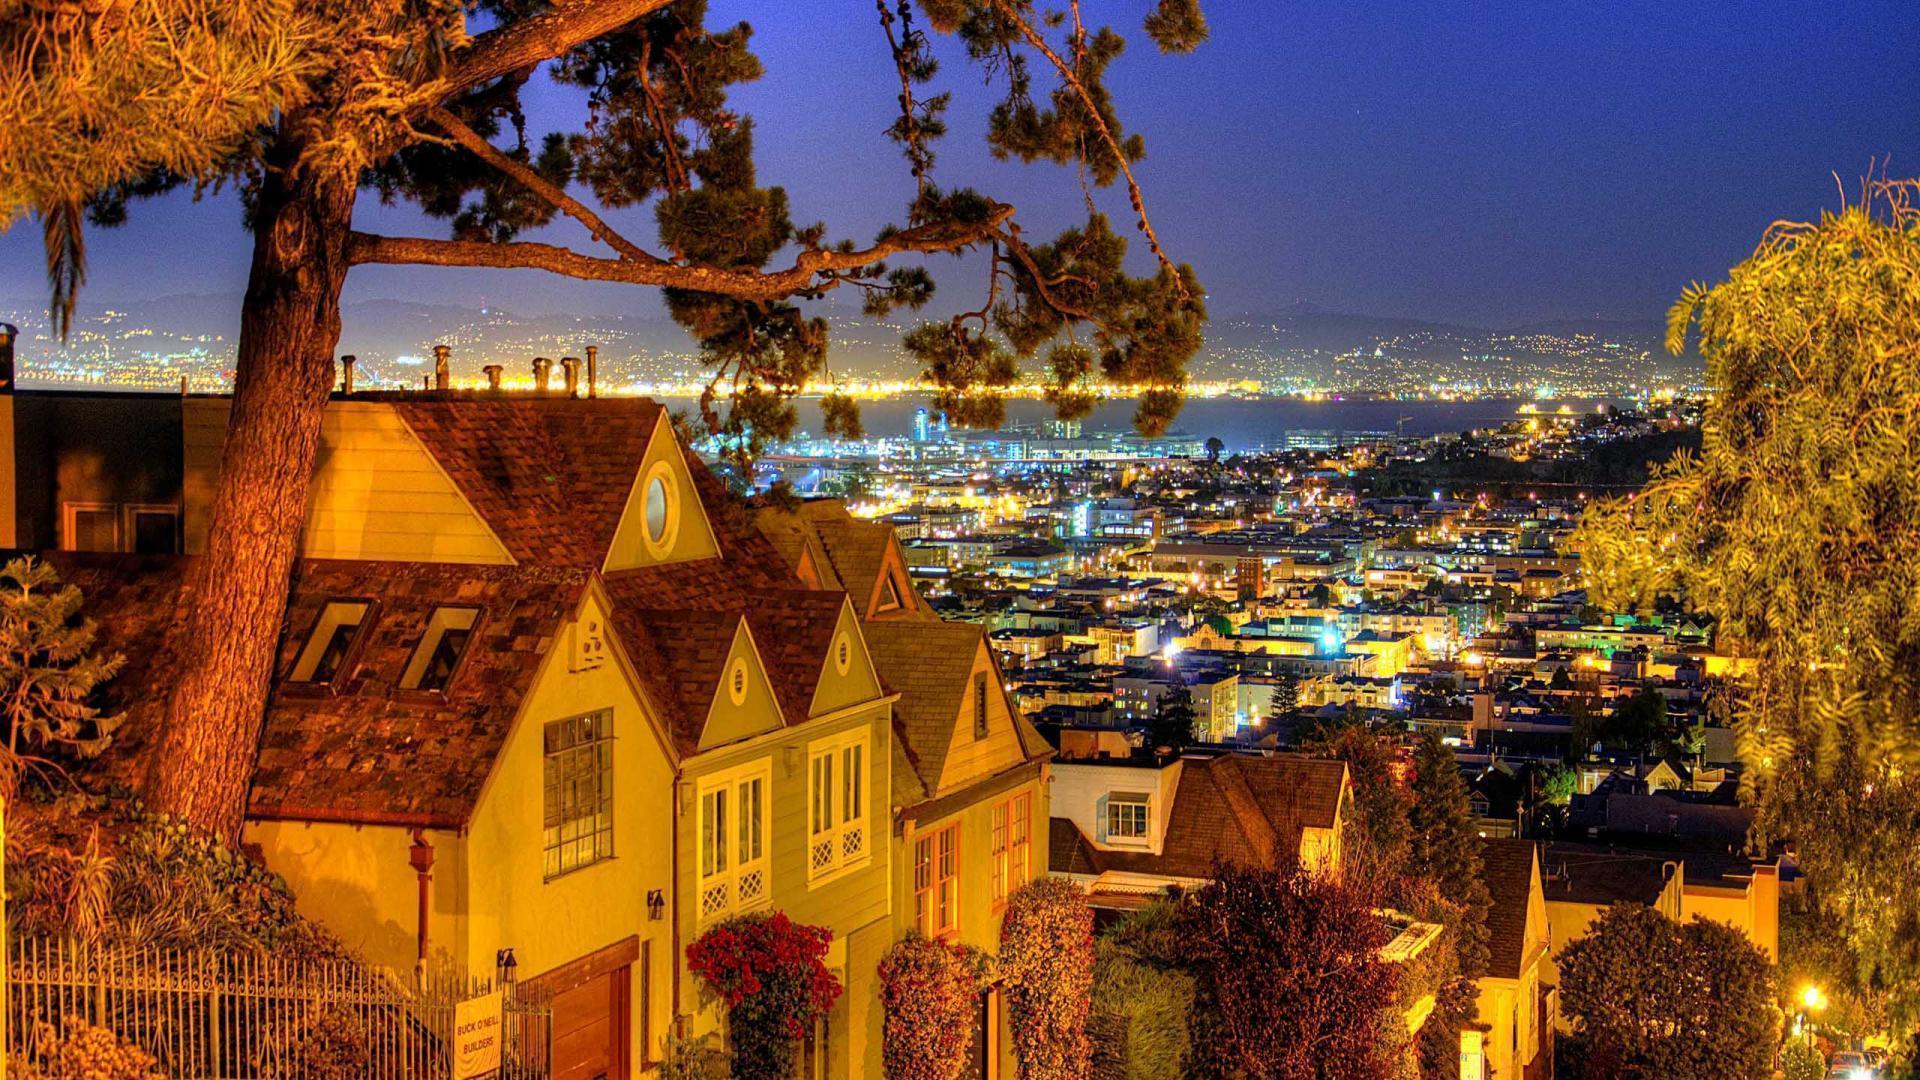 Free San Francisco Wallpapers - Wallpaper Cave